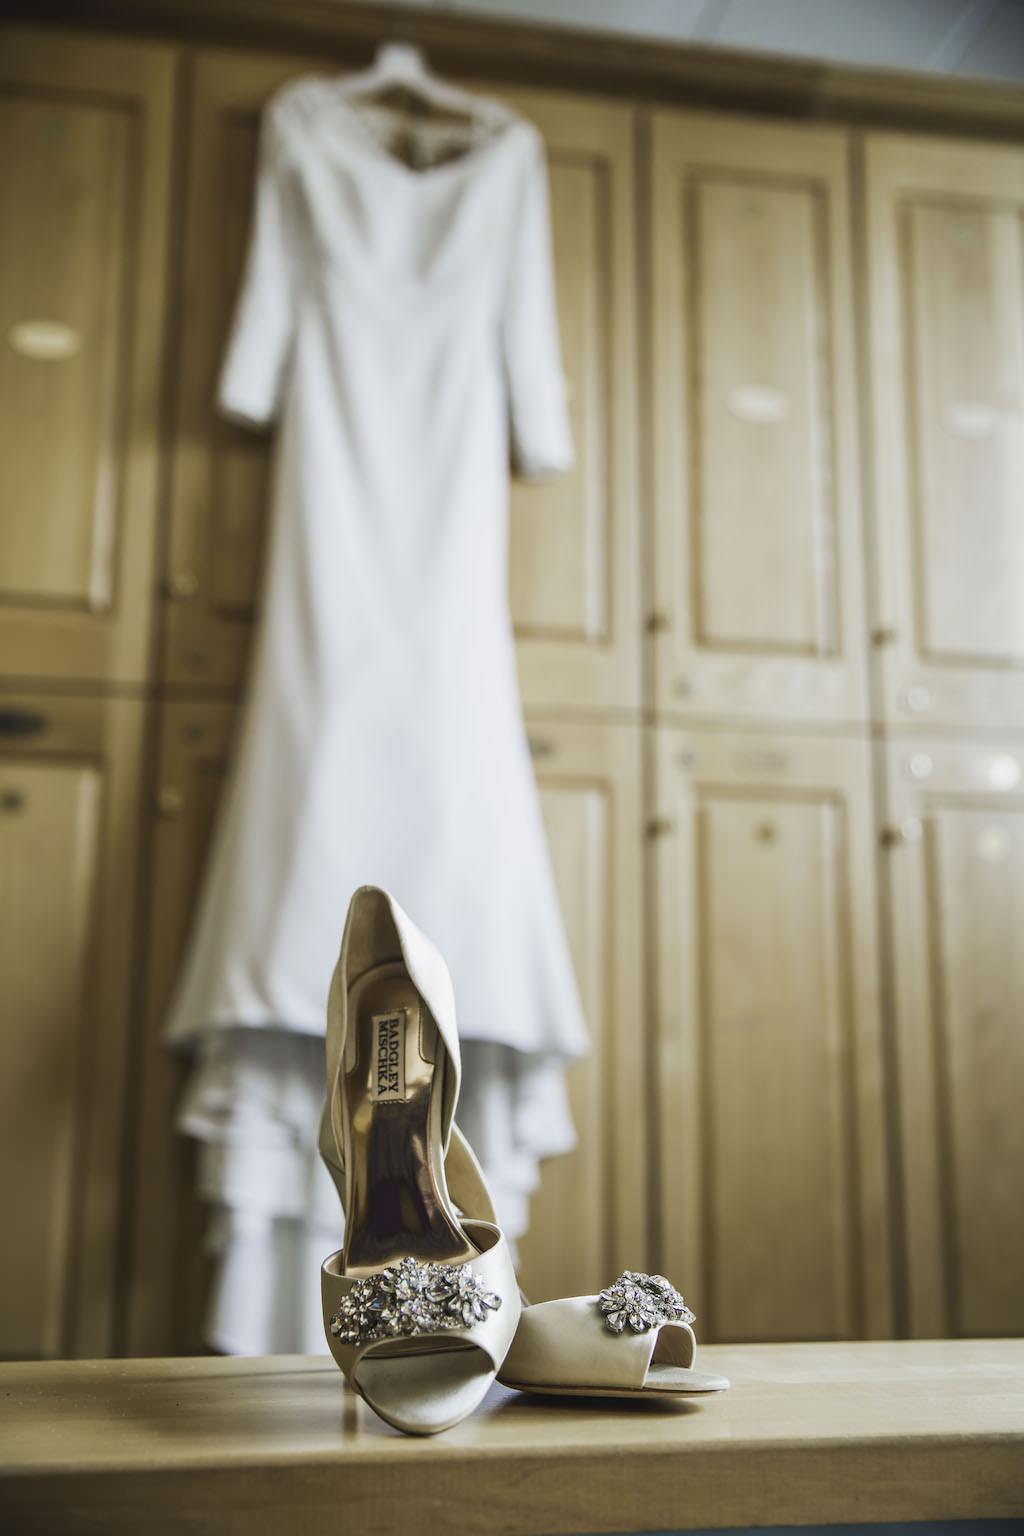 Badgley Mischka Off White Satin Peep Toe with Rhinestone Accent Wedding Shoes